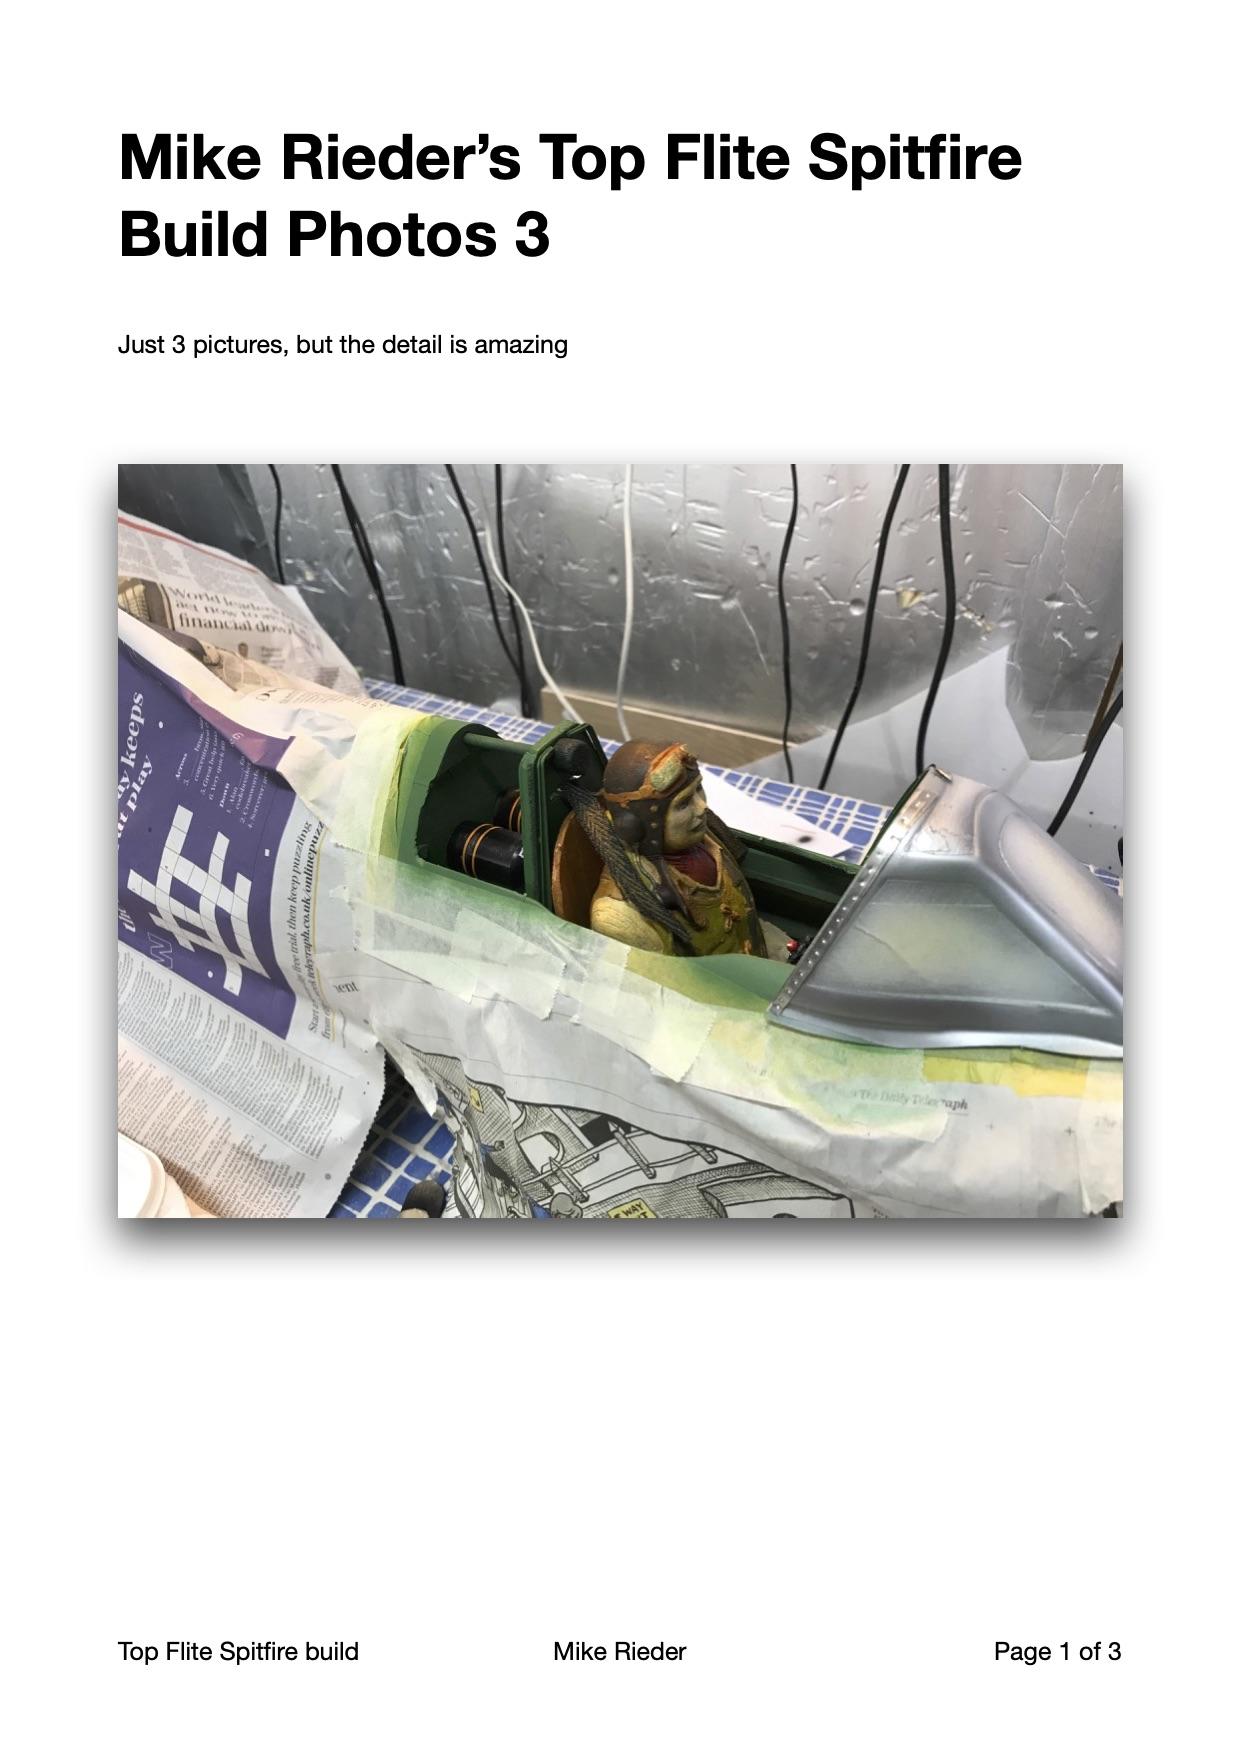 Mike Rieder Spitfire Pilot & Wing Detailing